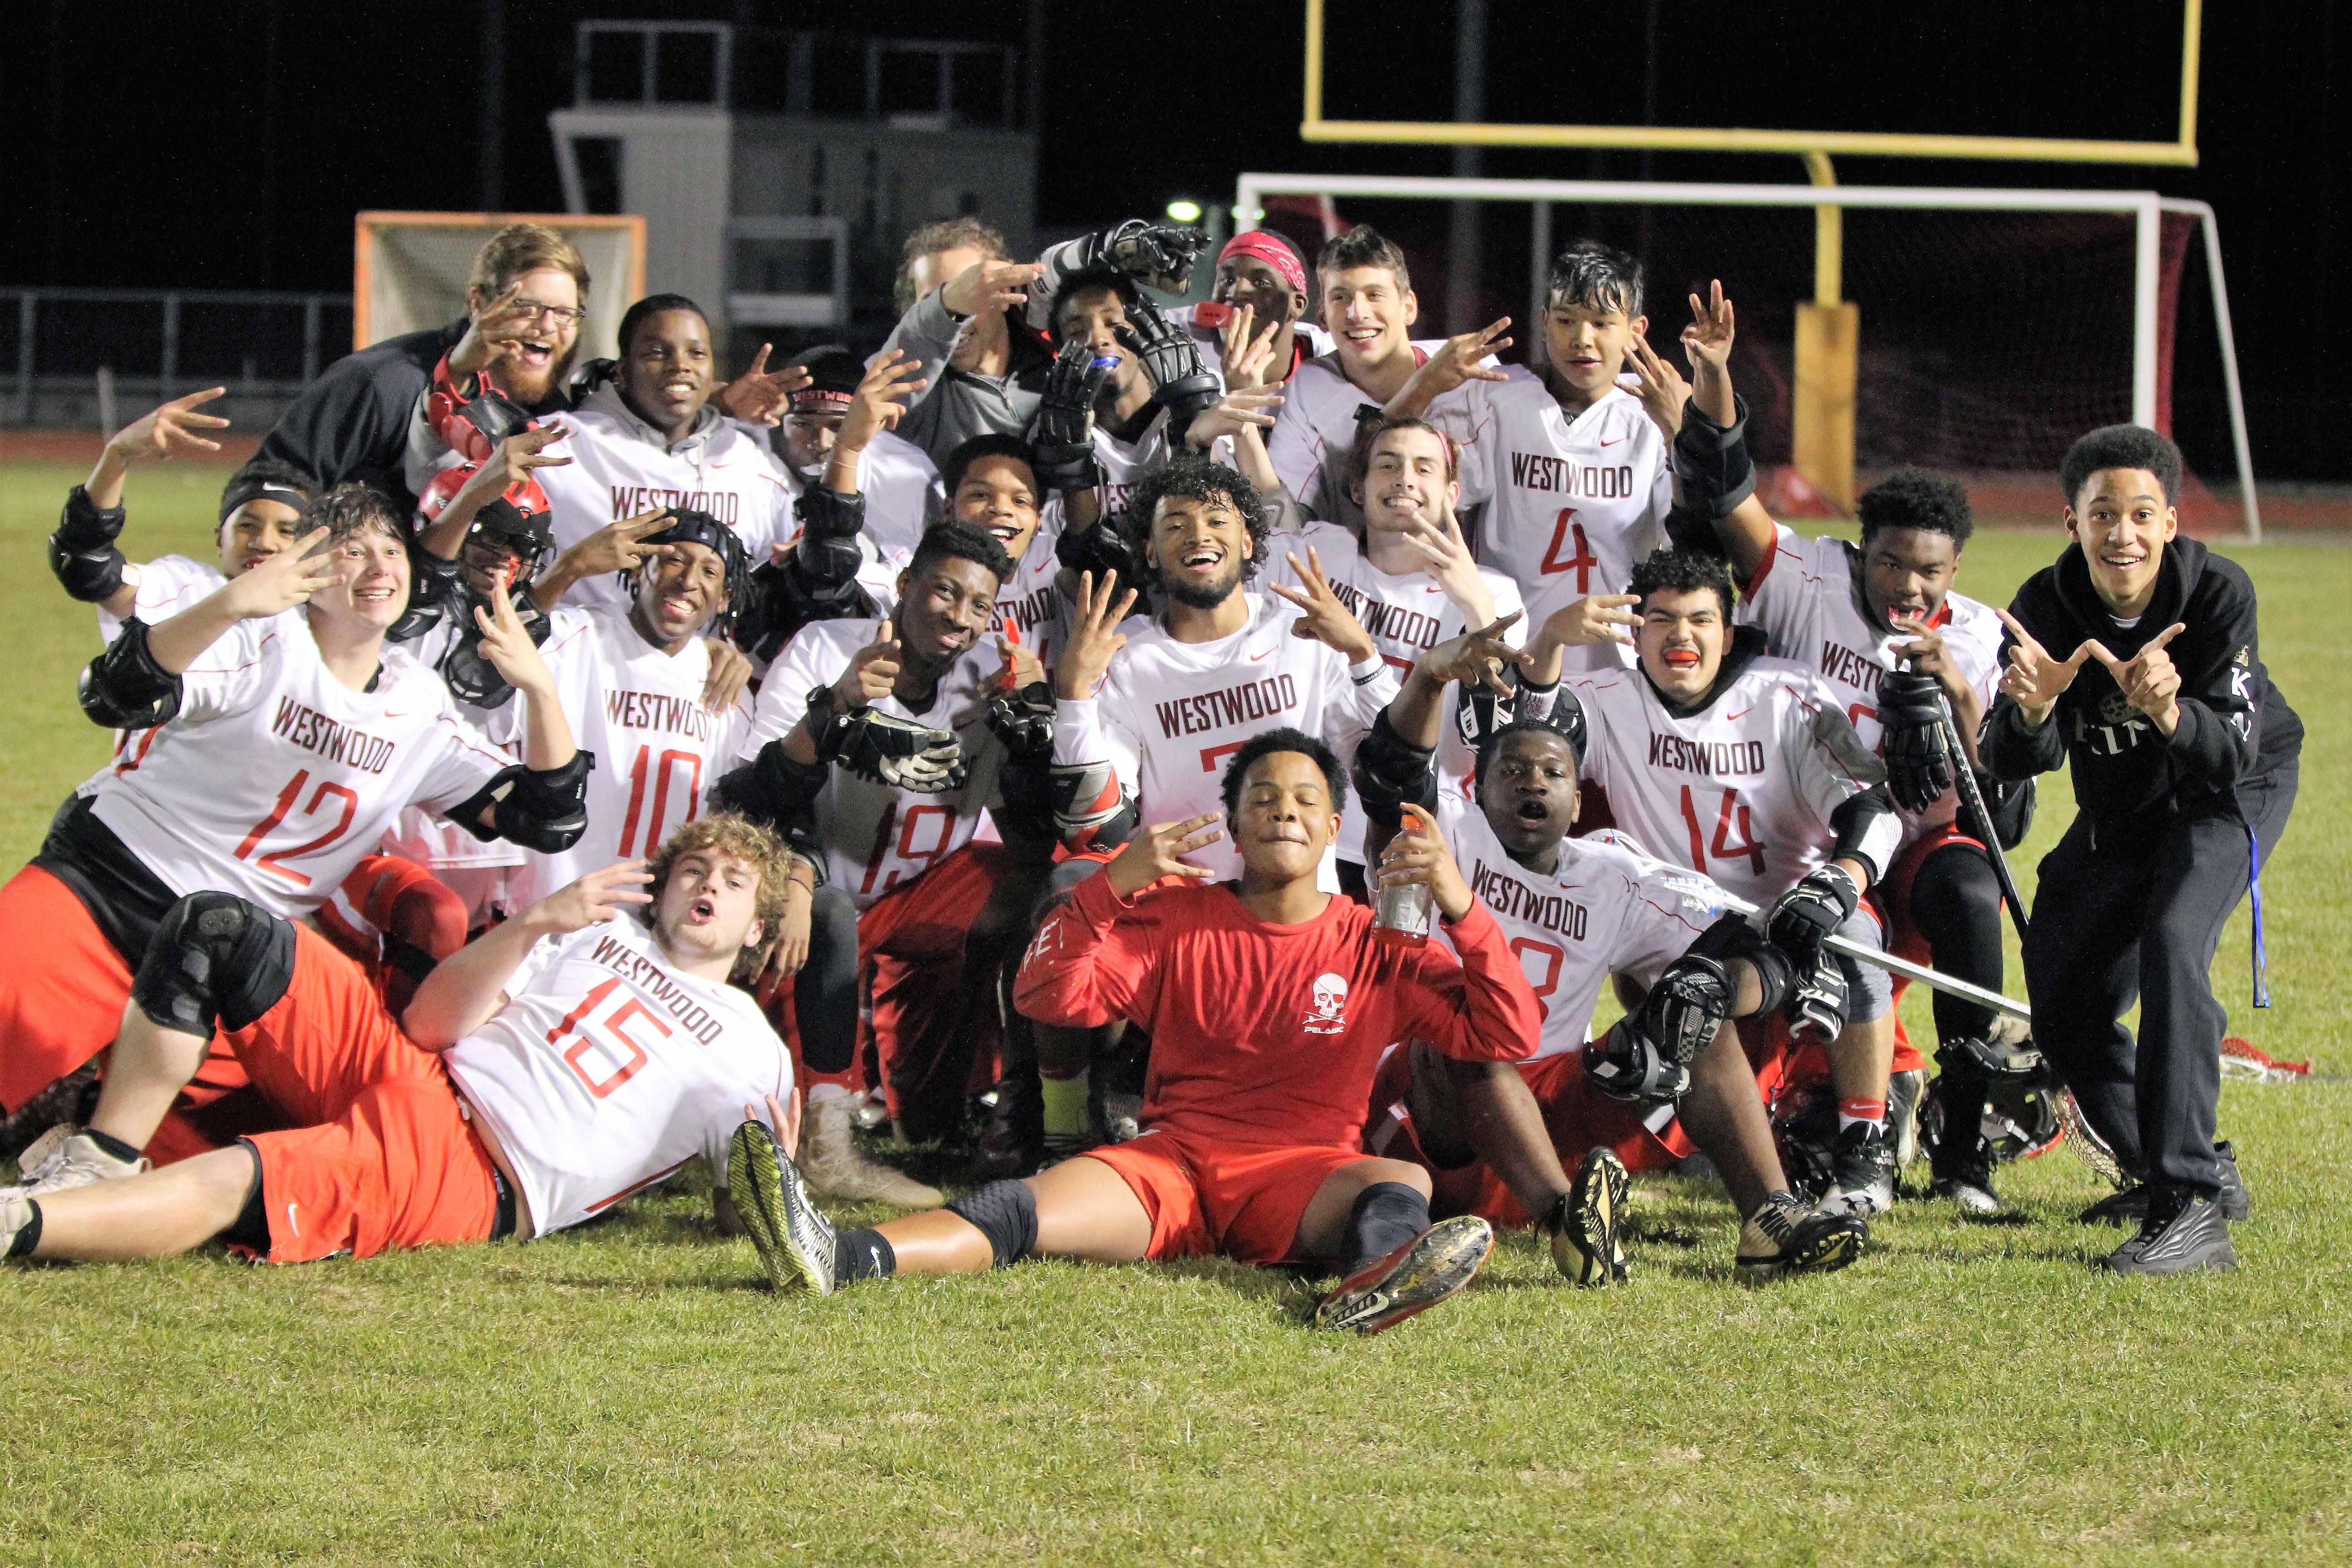 Redhawk Lacrosse Records 1st Ever Win